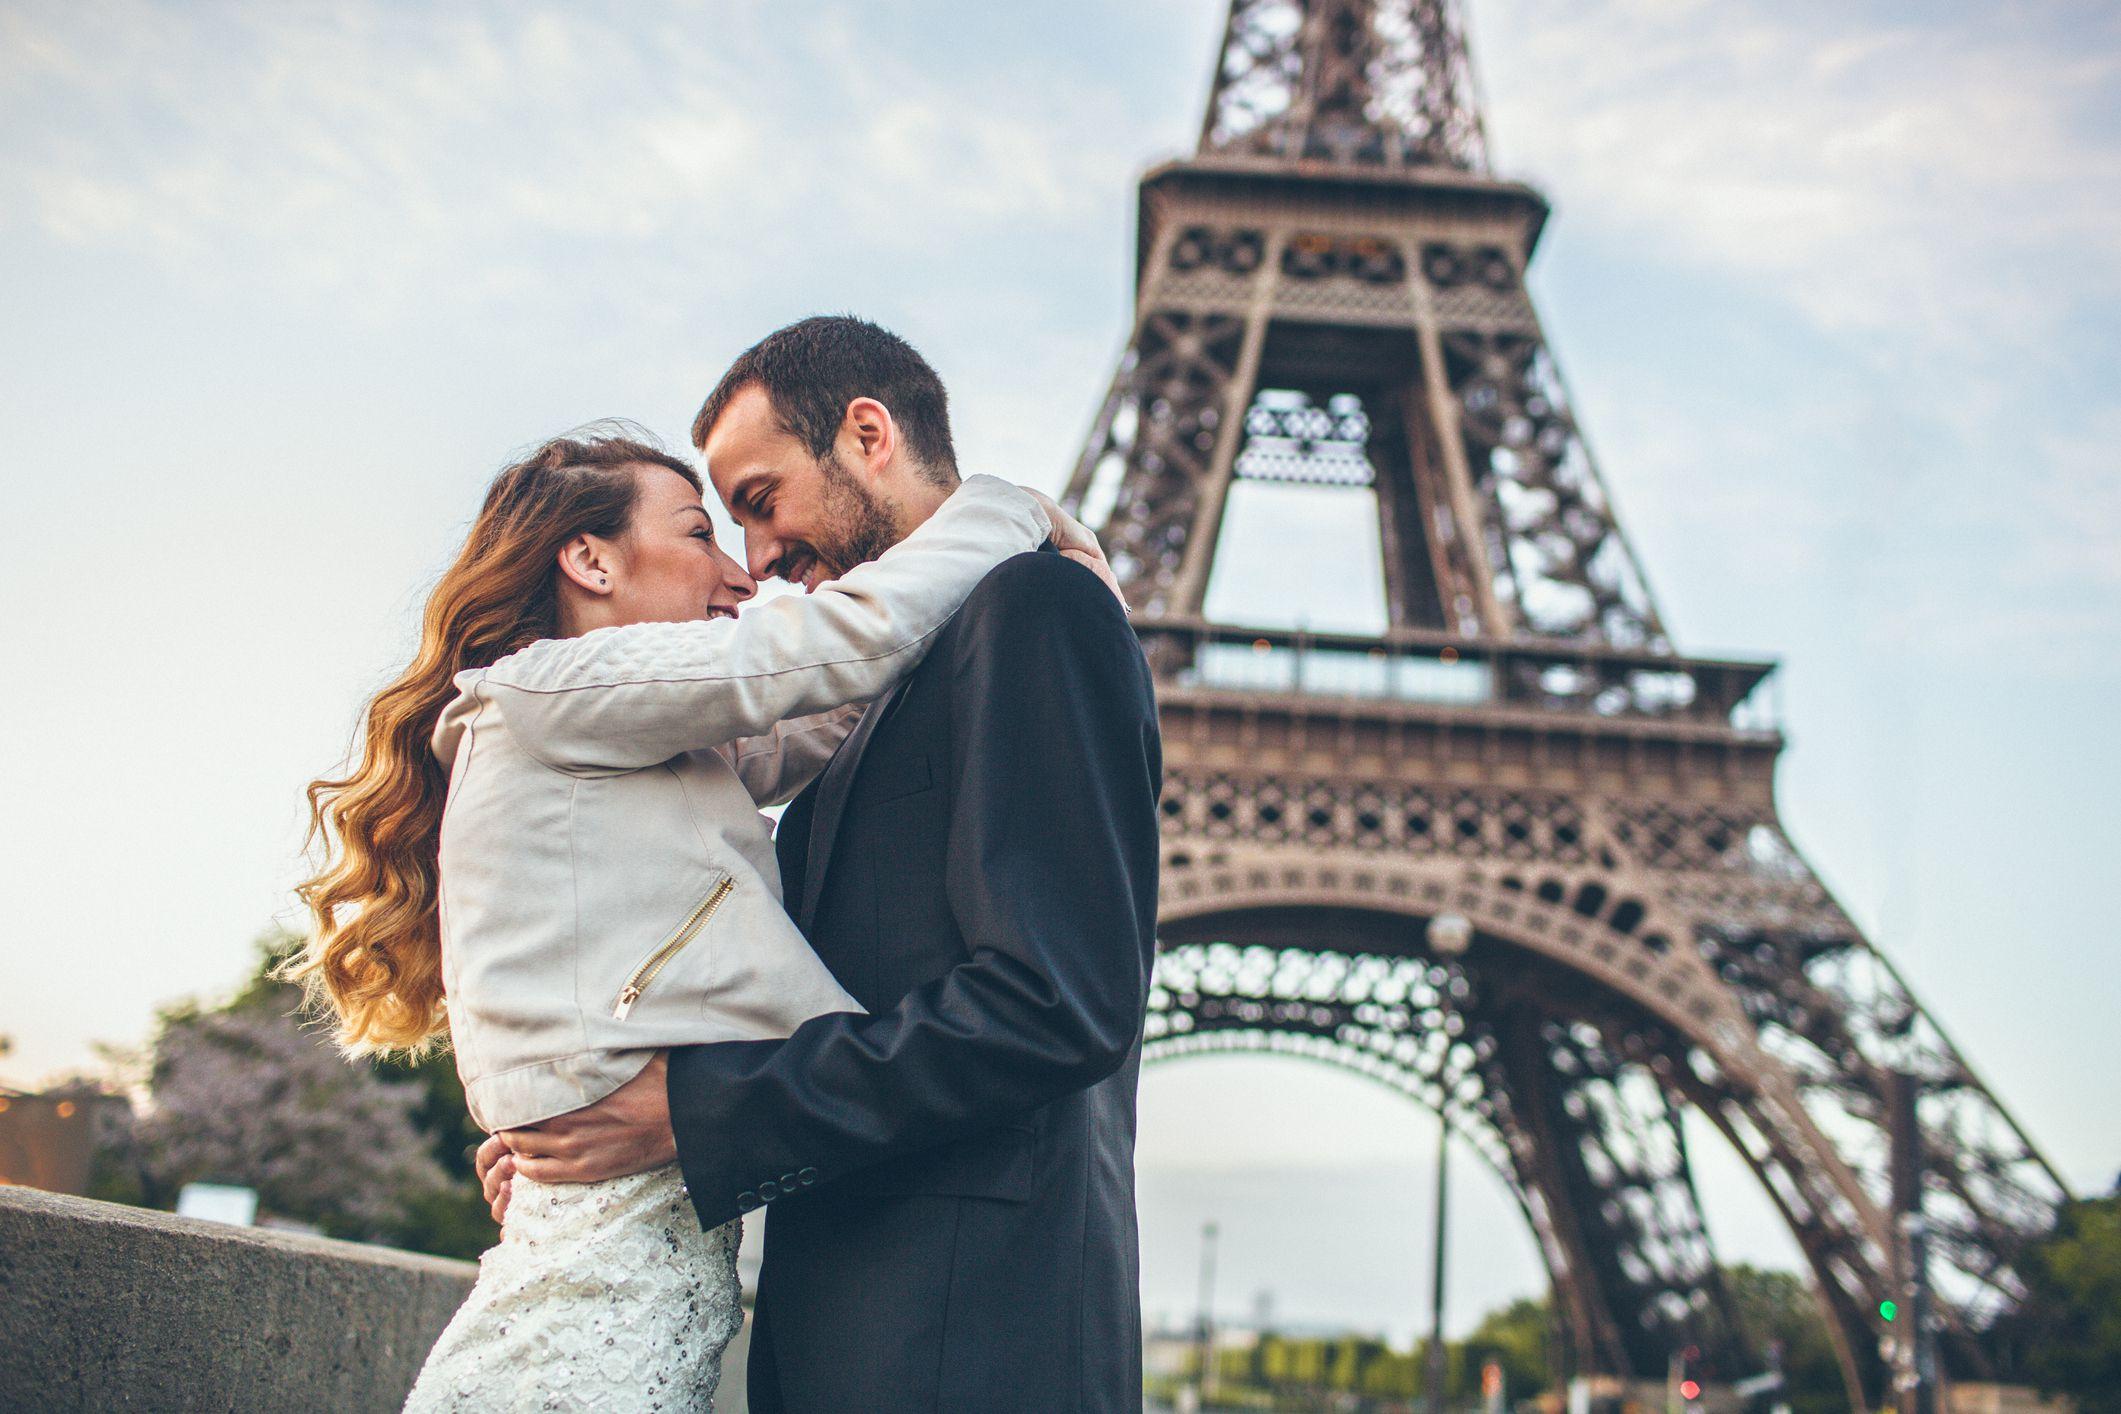 How To Plan A Romantic Honeymoon In Paris